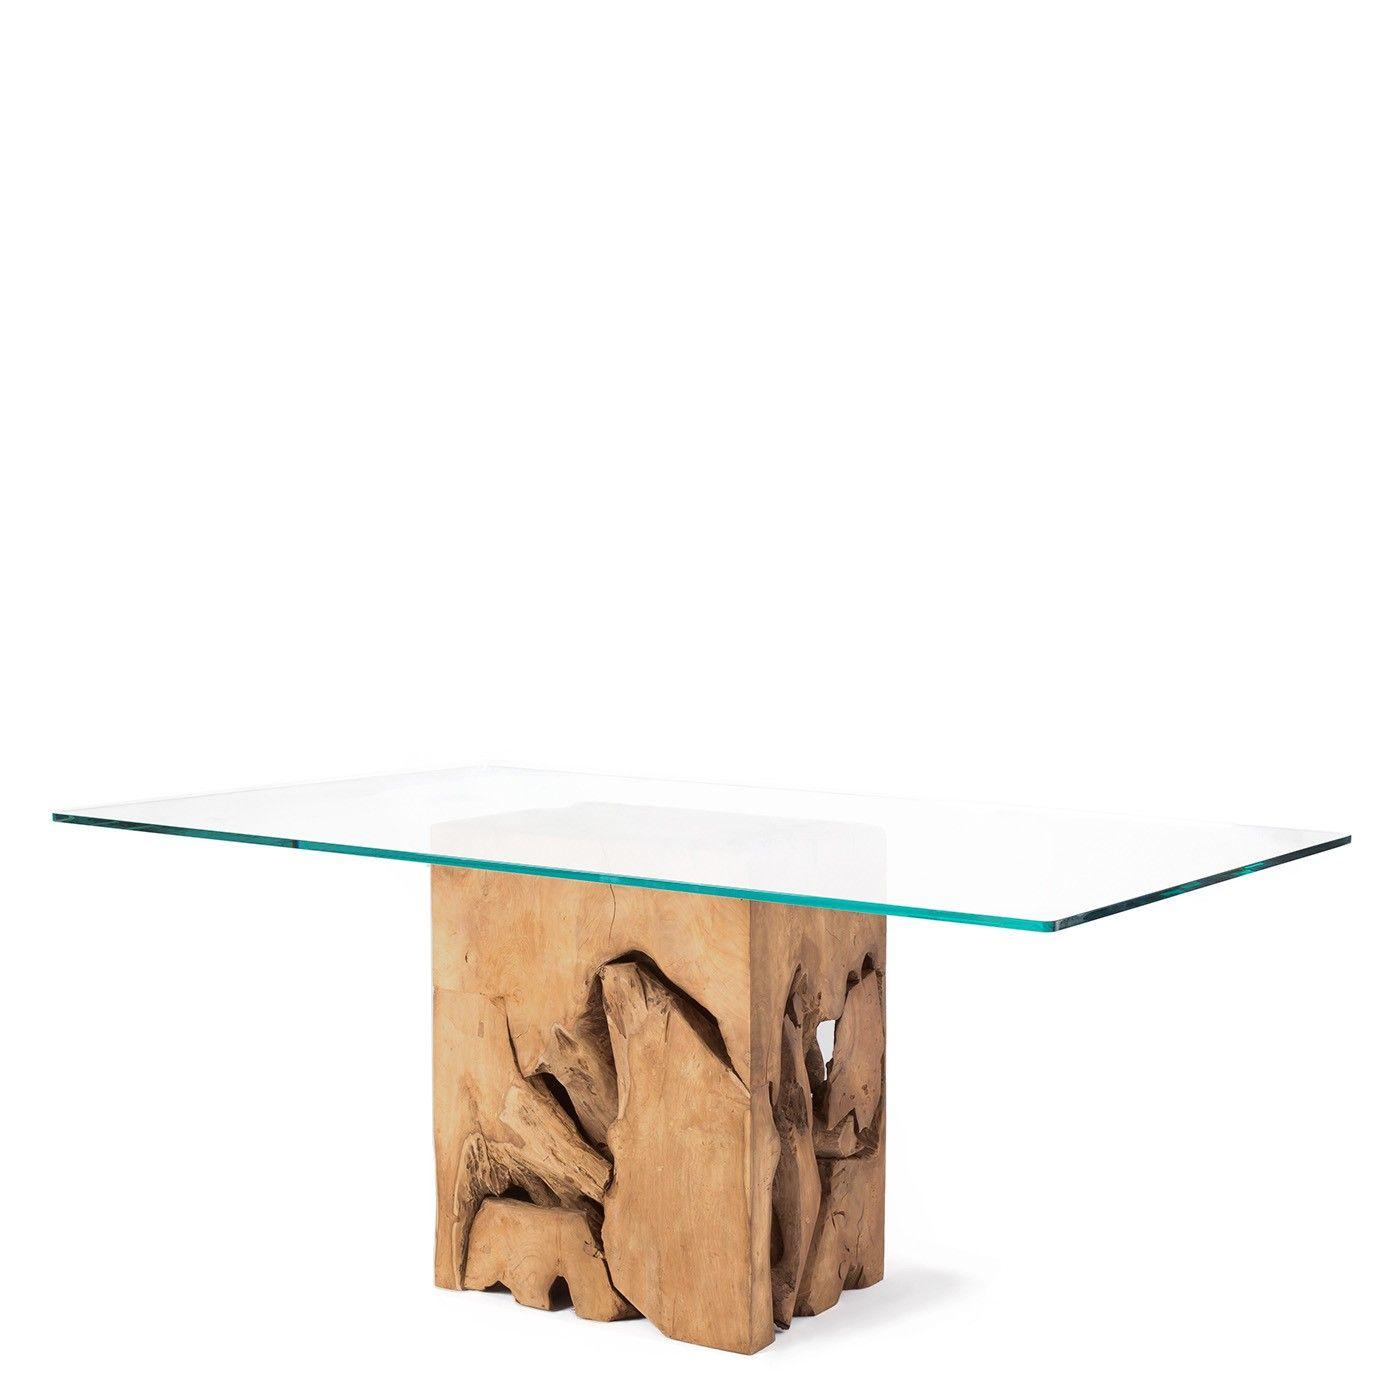 Teak Root Glass Top Dining Table Natural Teak   Raft Furniture  London. Teak Root Glass Top Dining Table Natural Teak   Raft Furniture